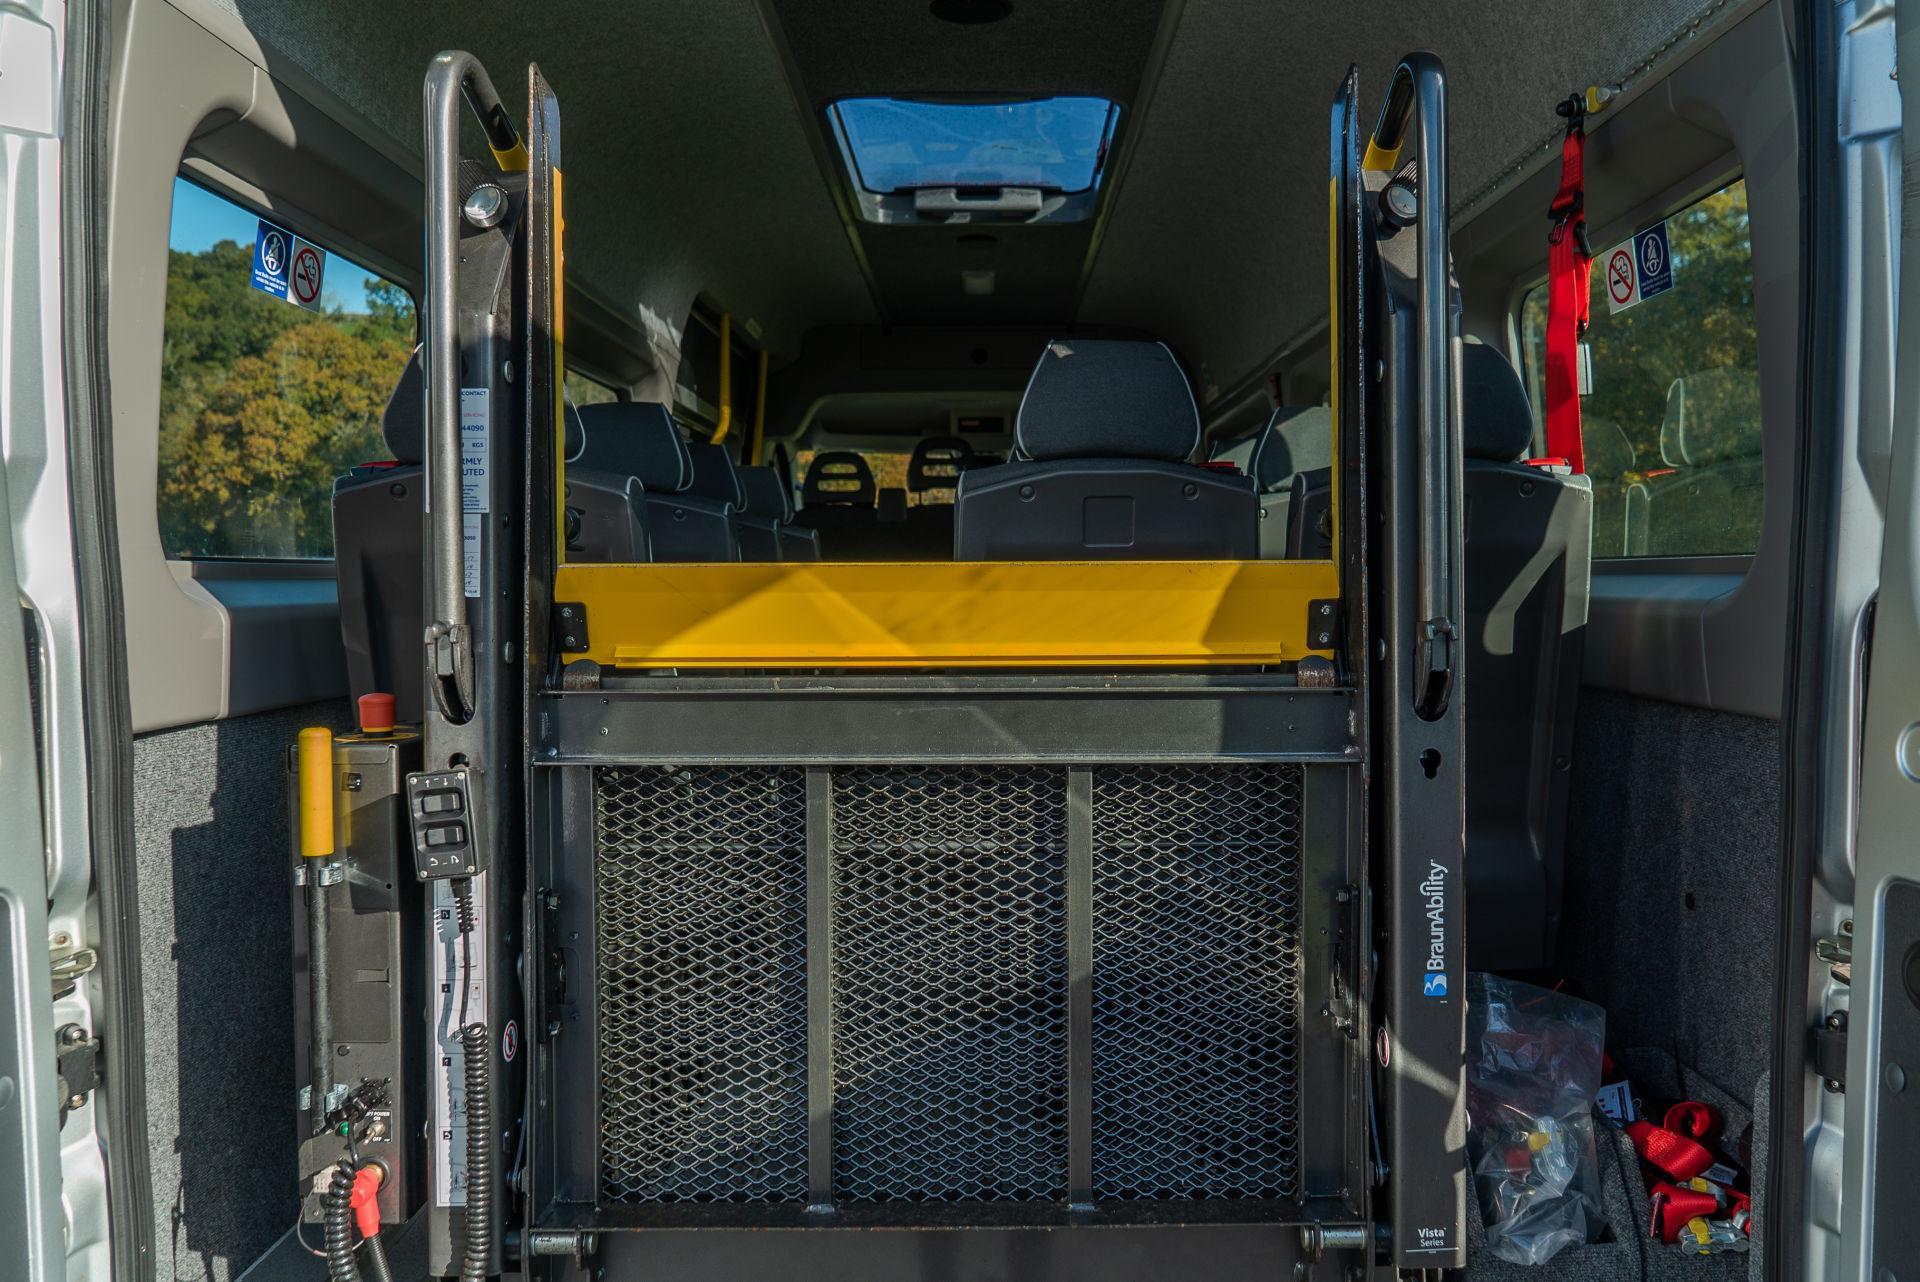 Peugeot Boxer 17 Seater Accessible Minibus for Sale - Image 4